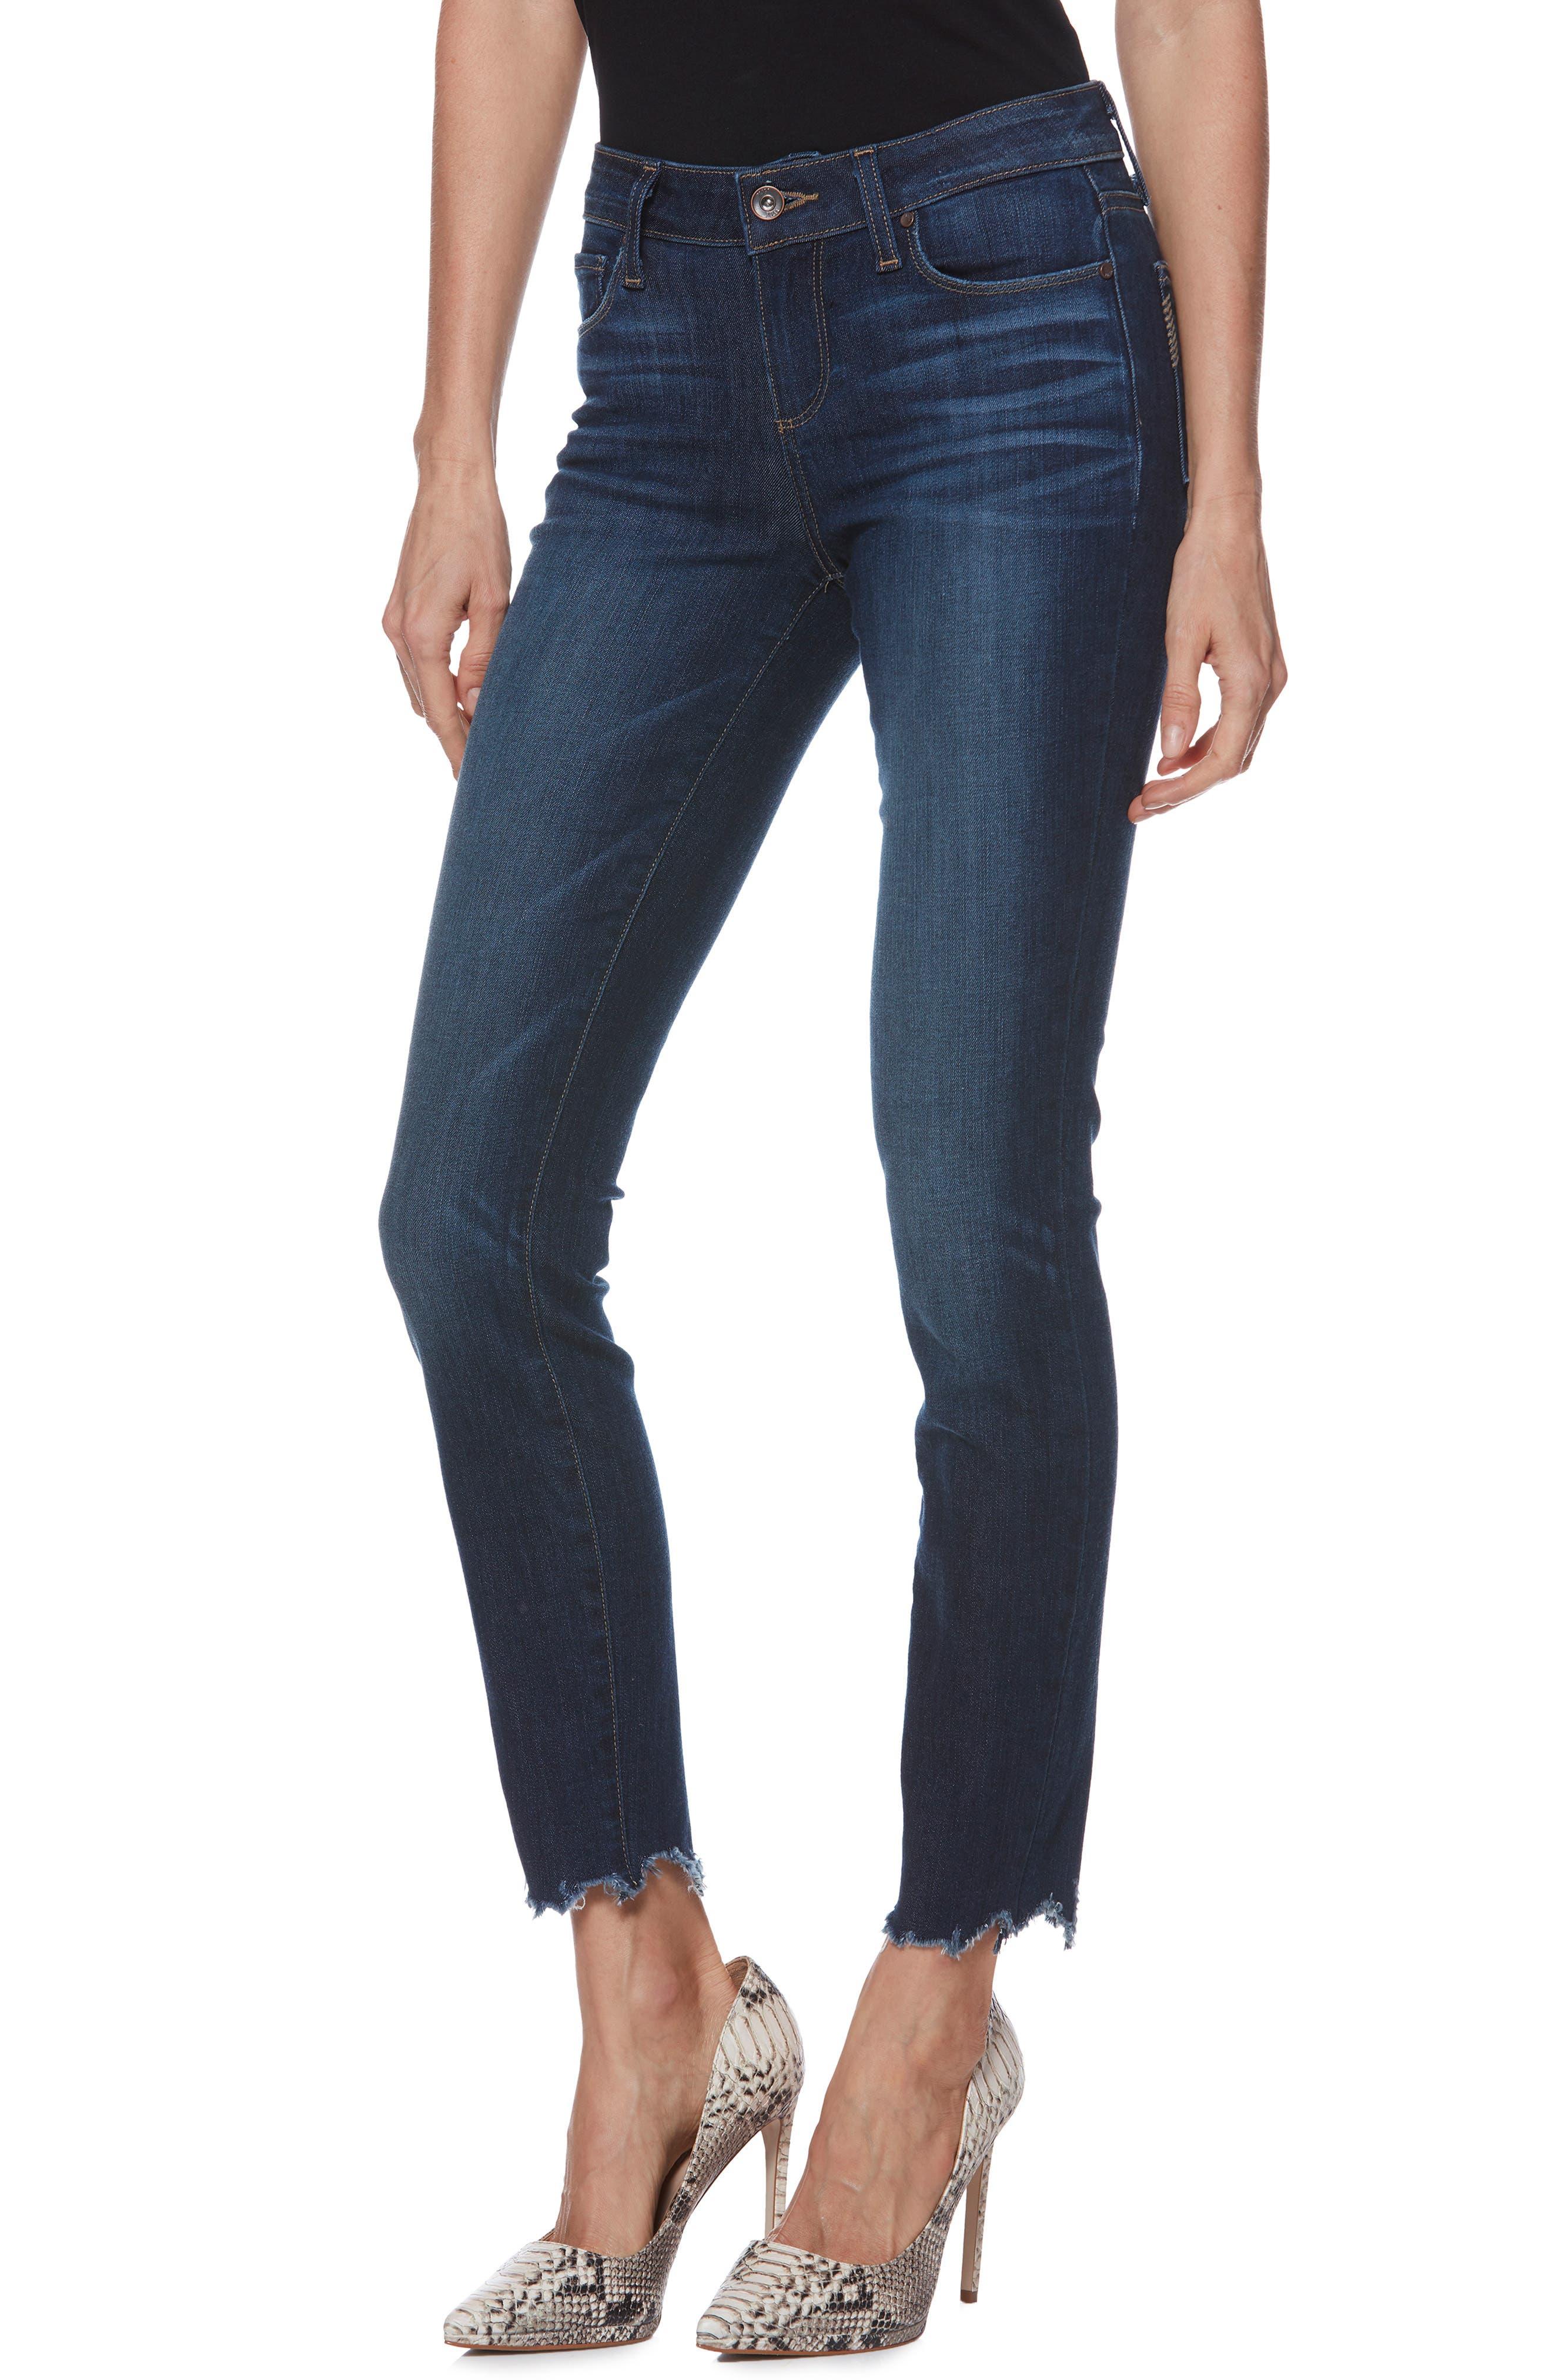 Verdugo Transcend Vintage Ankle Skinny Jeans,                             Main thumbnail 1, color,                             400